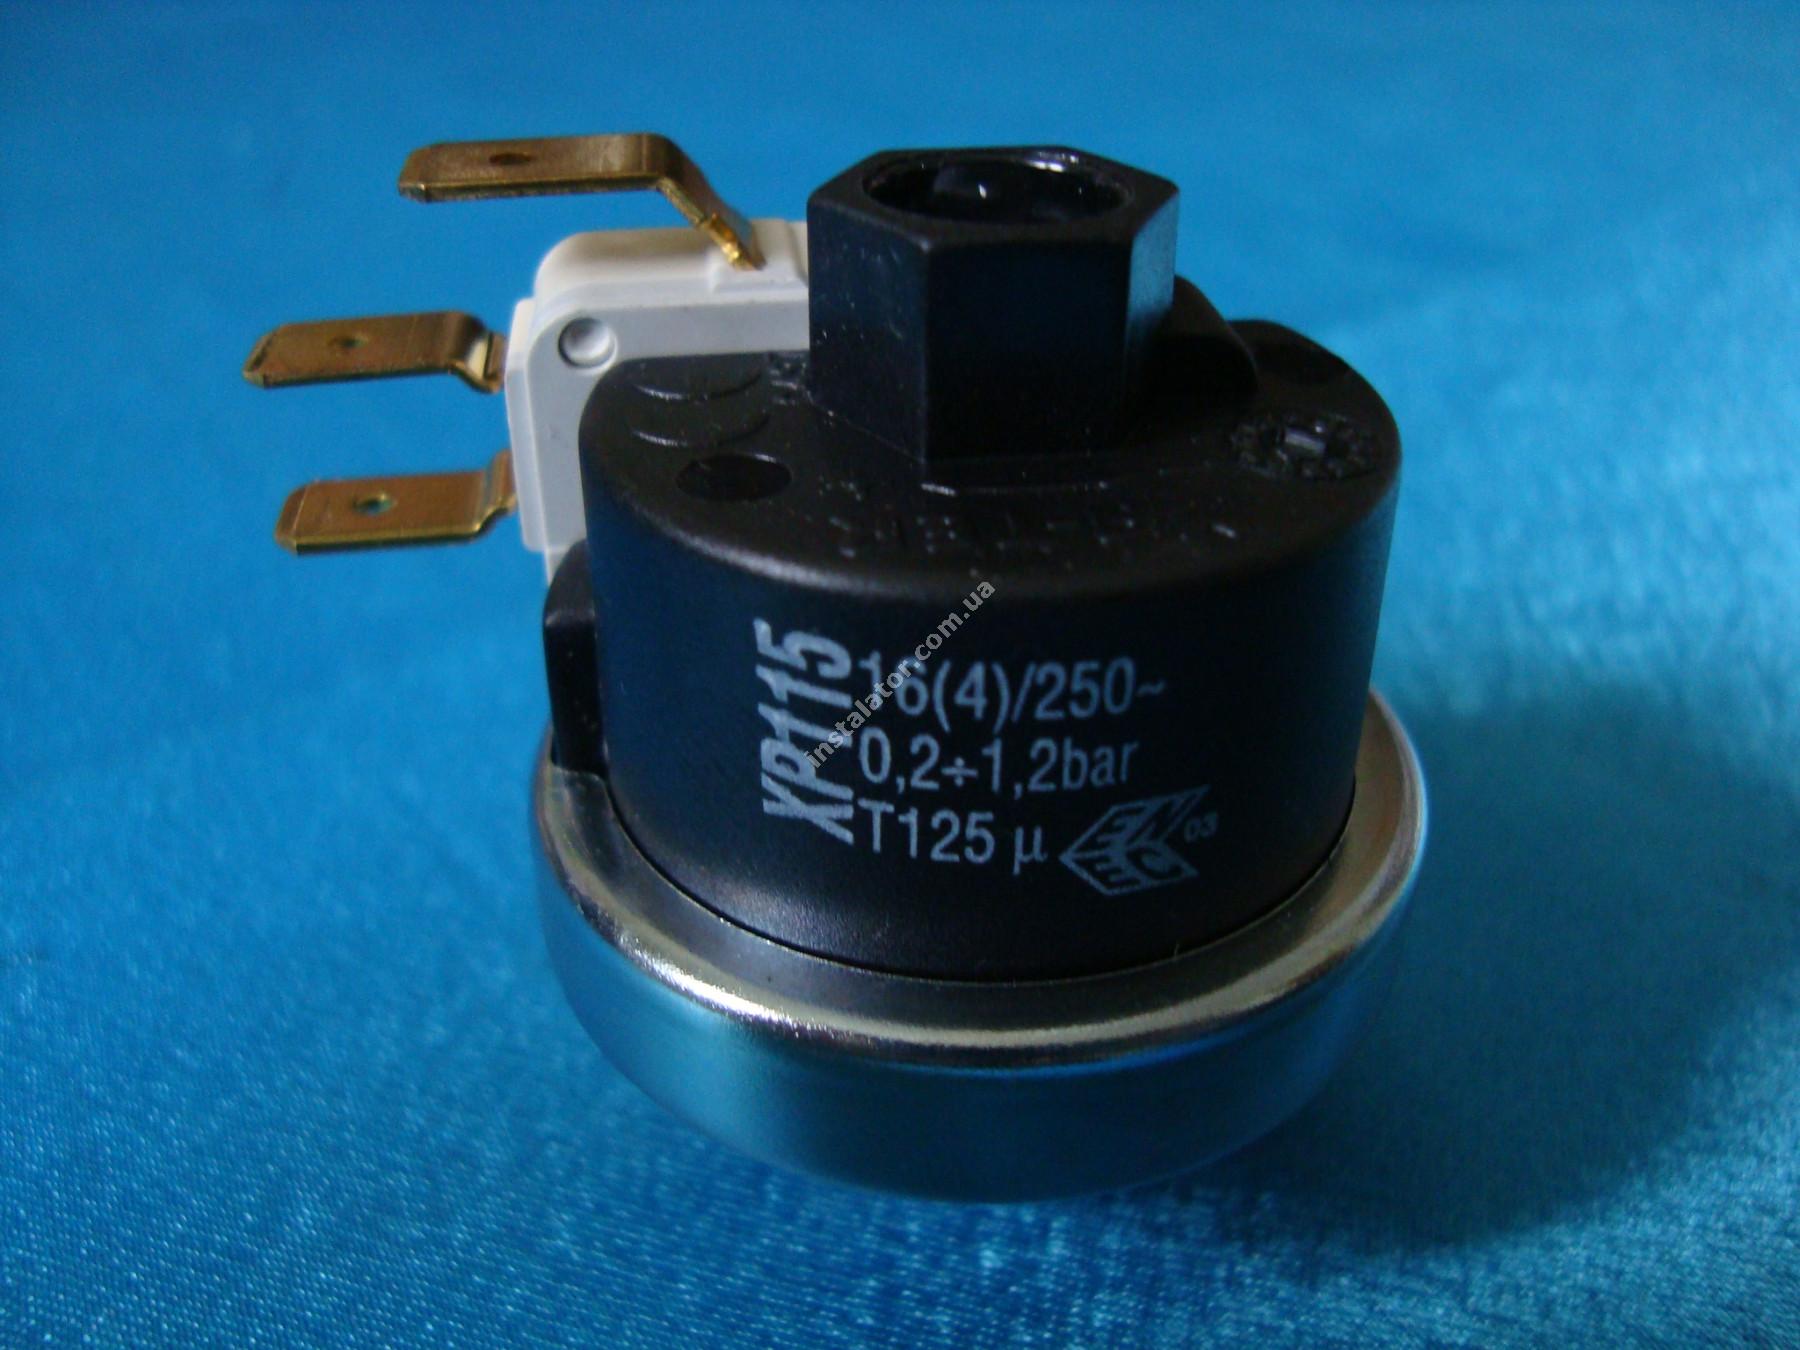 6PRESSAC01 Реле давления воды Vela Compact 0,2-1,2 бар full-image-5